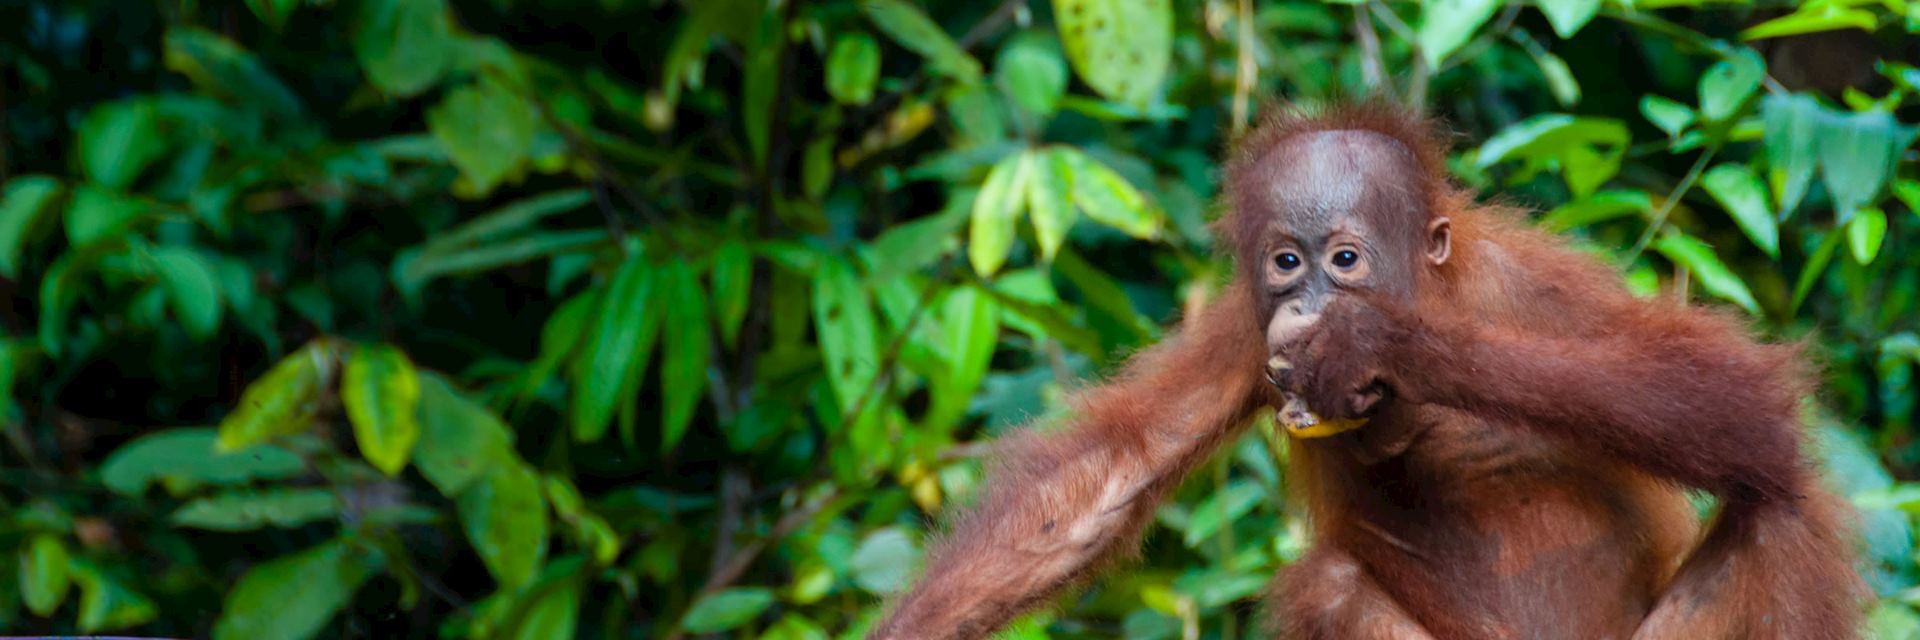 Young orangutan, Indonesia